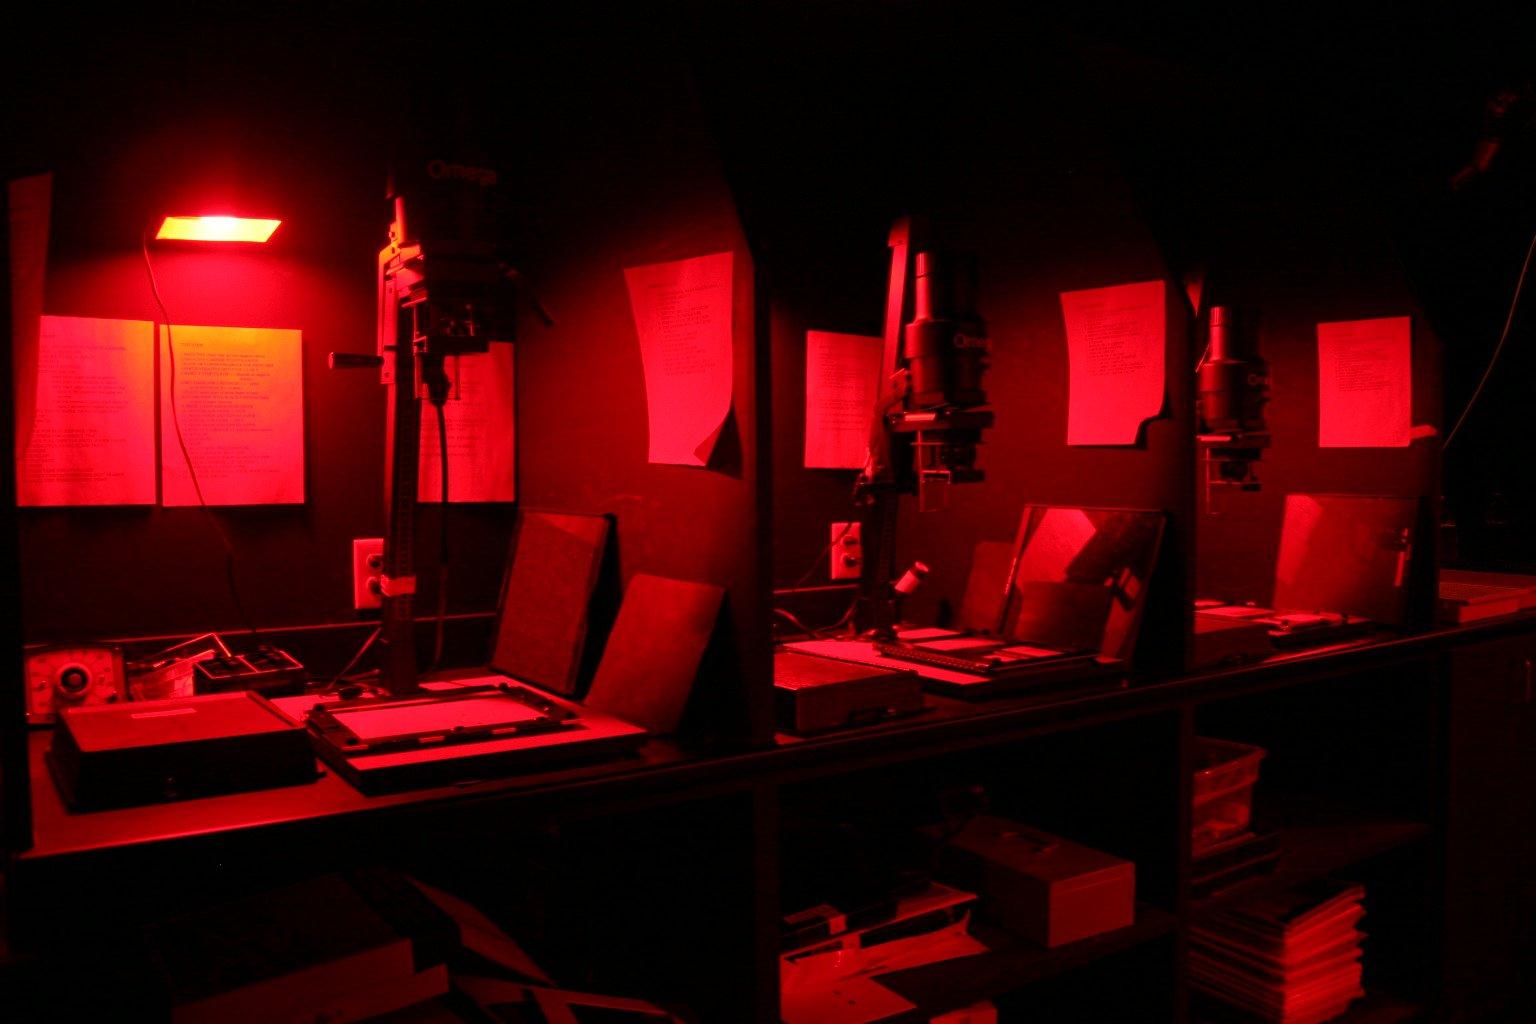 photographic darkroom manipulation creativity leadership programs training fall short why room dark churchm ag